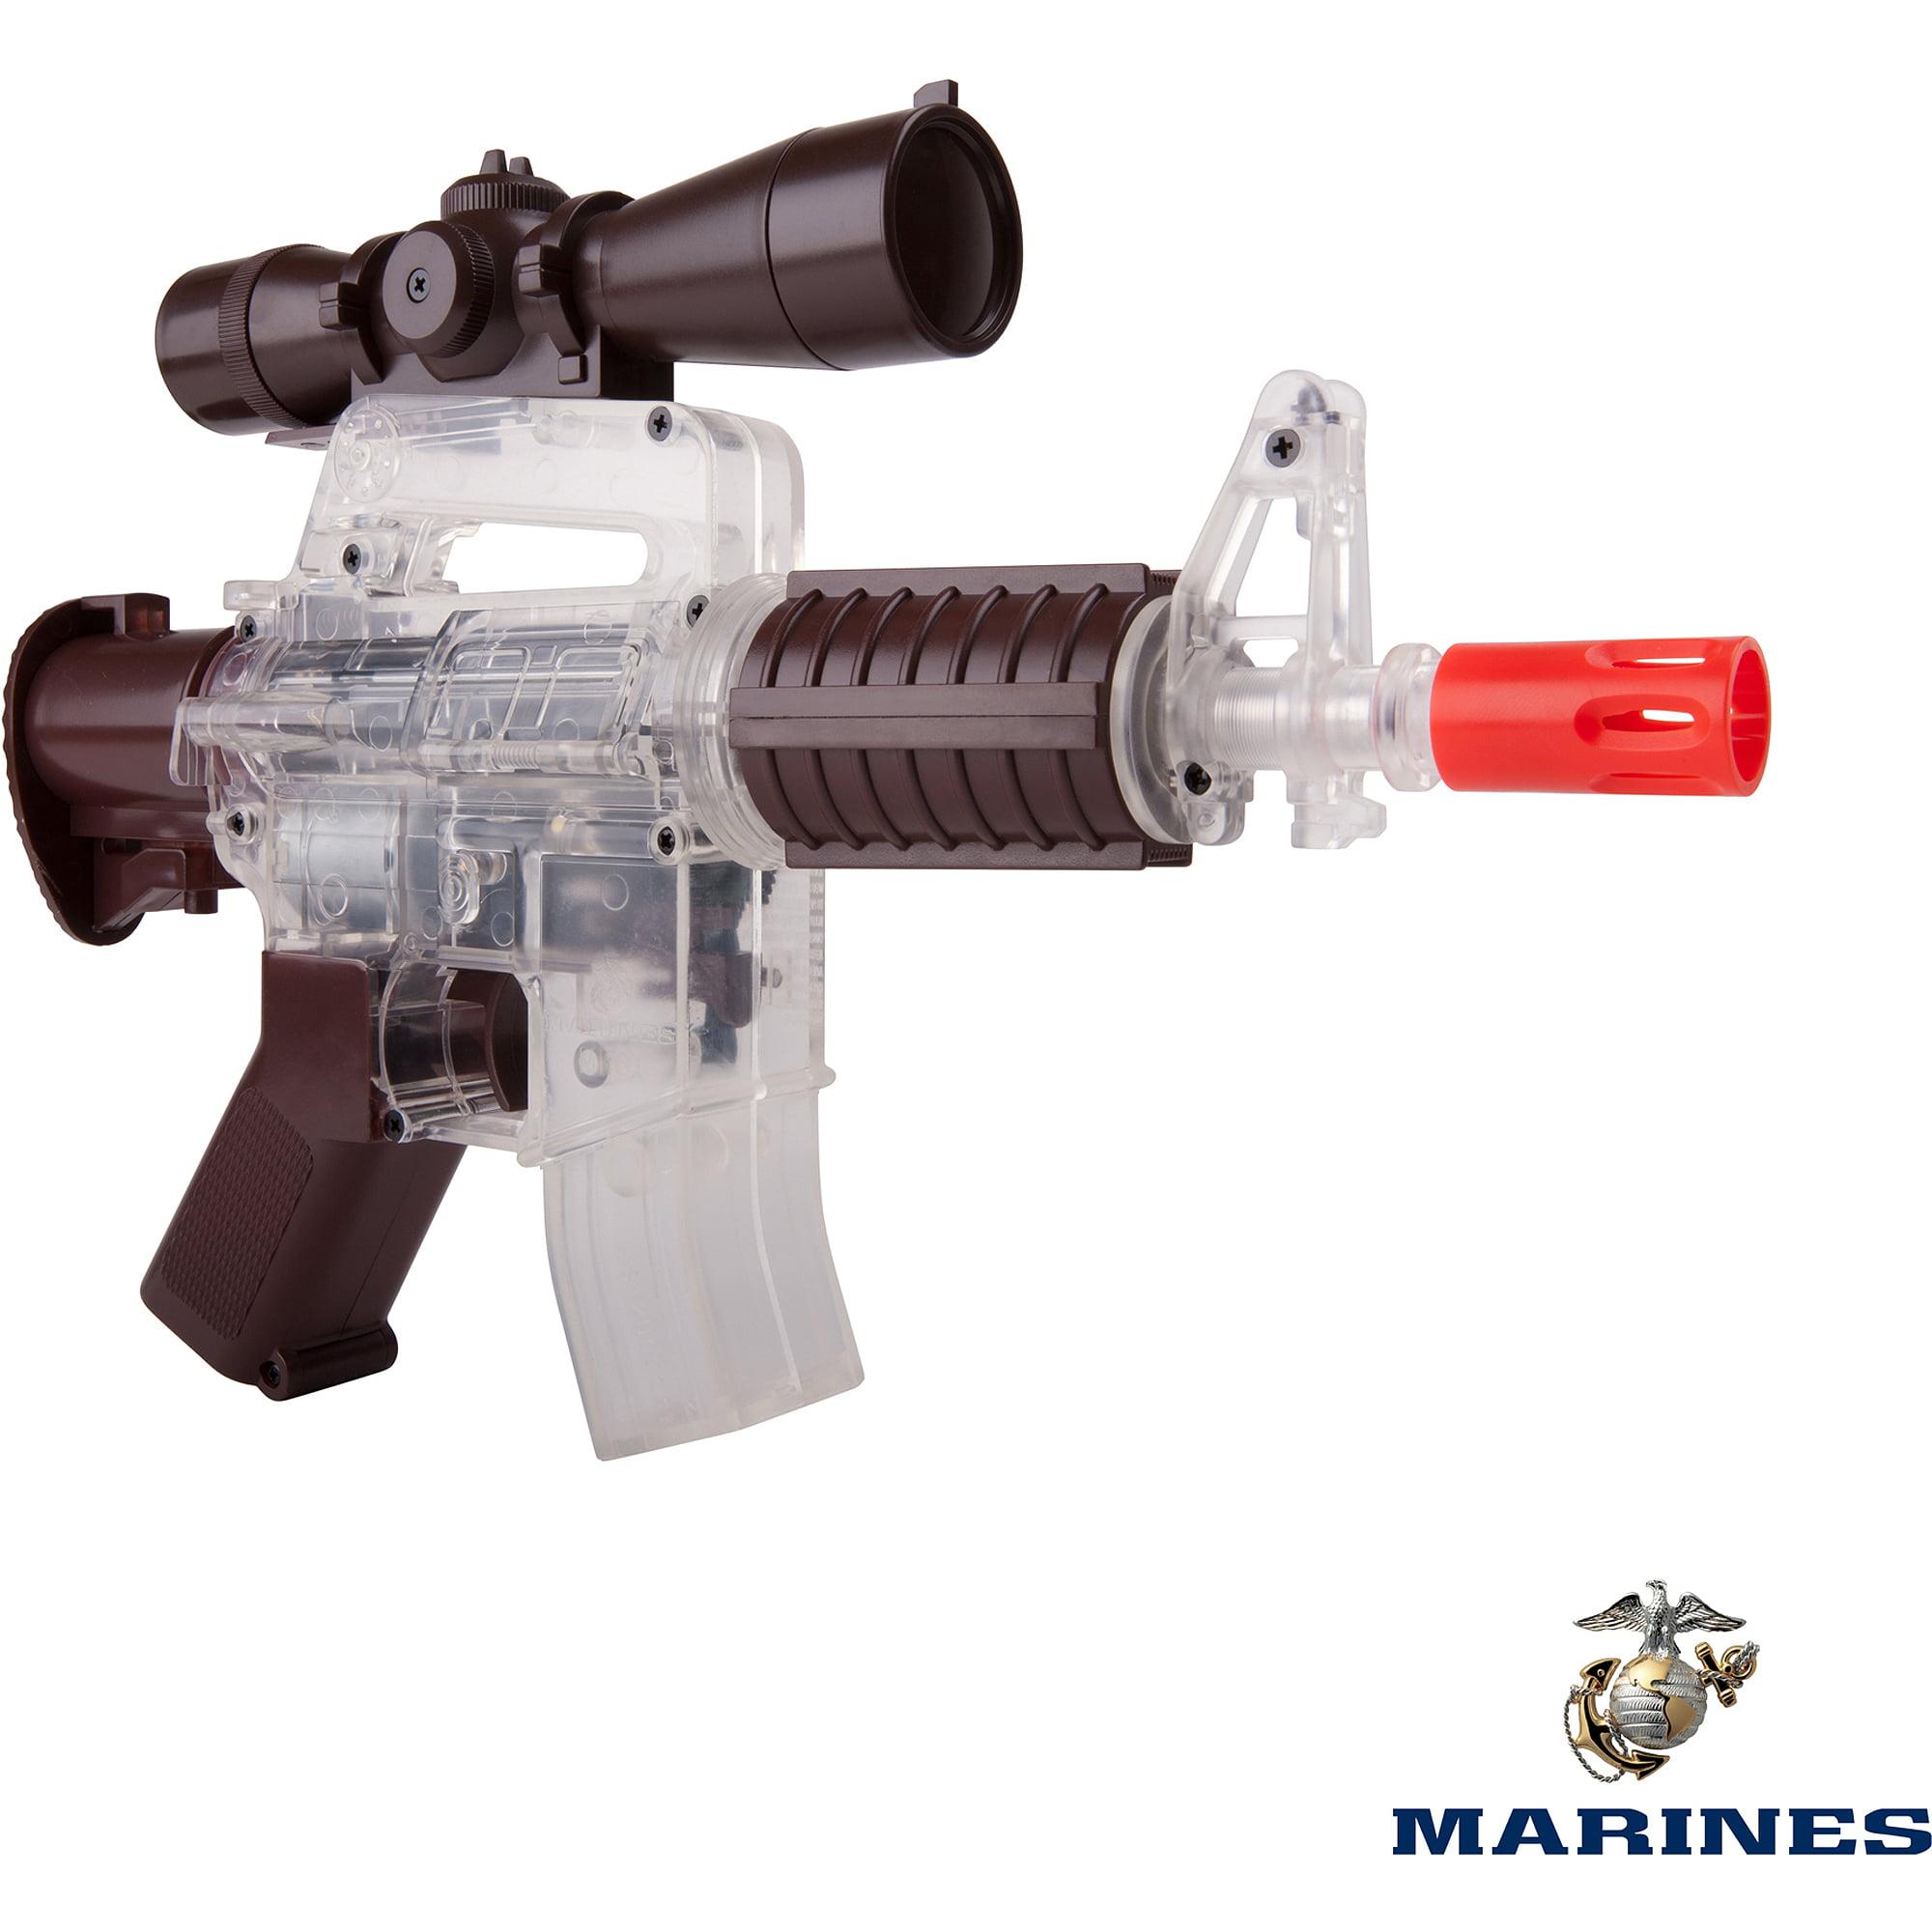 Crosman U.S Marines MR01 Airsoft Close Support Mini Rifle, Coyote Brown